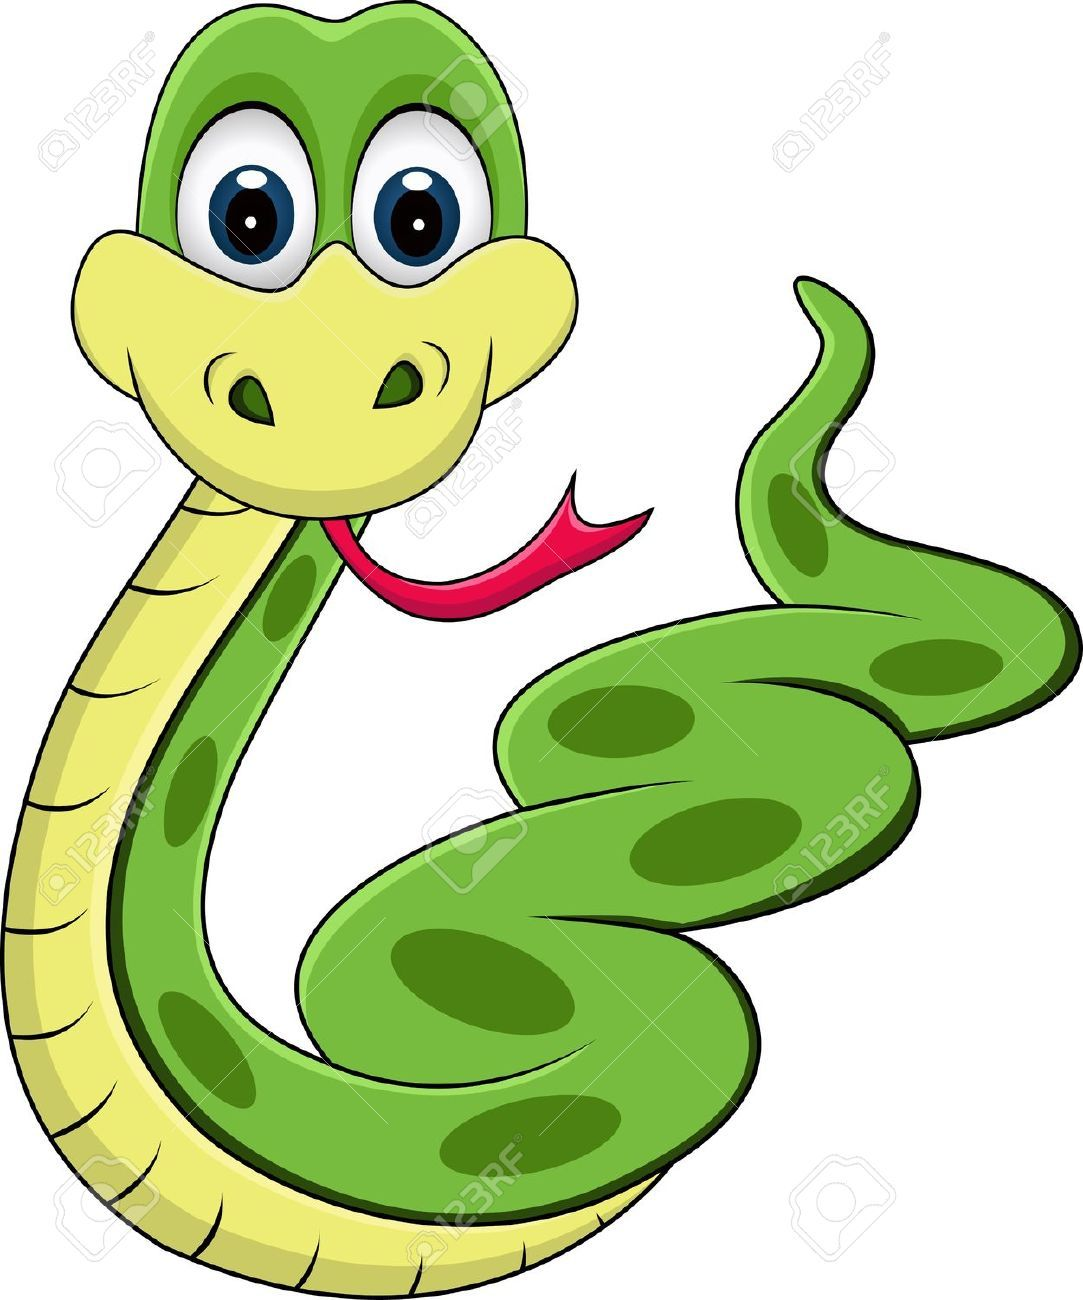 pin by birgit keys on clip art cats big pinterest snake tattoo rh pinterest co uk Sea Serpent Cartoon Sea Serpent Cartoon